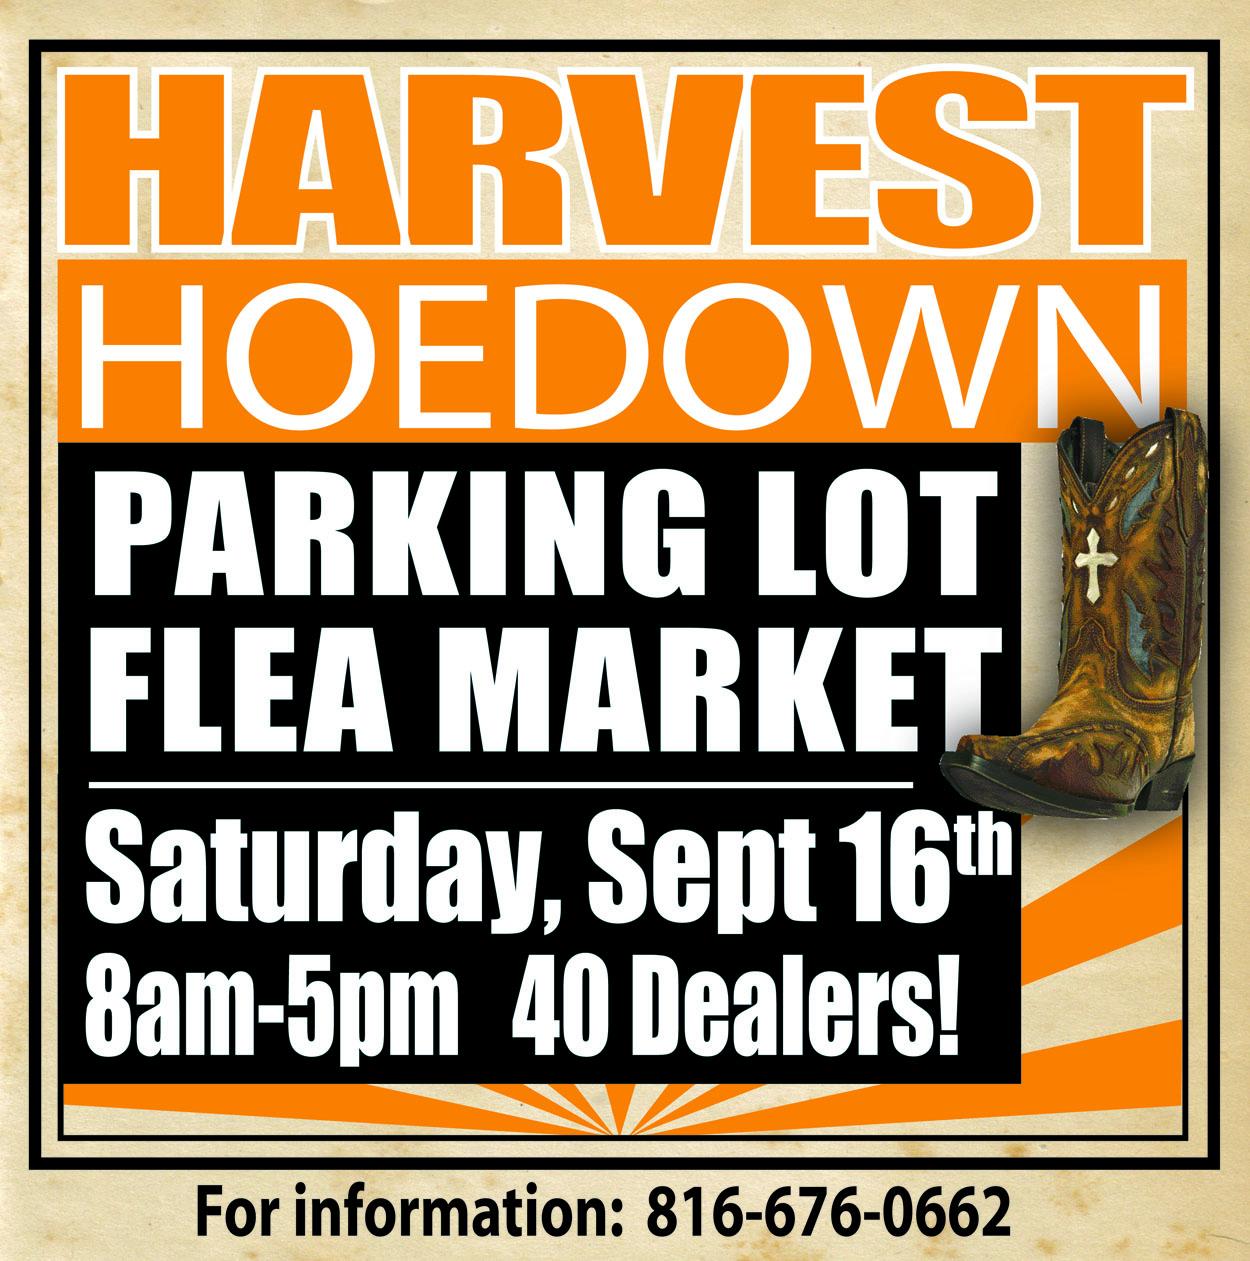 Harvest Hoedown Flea Market